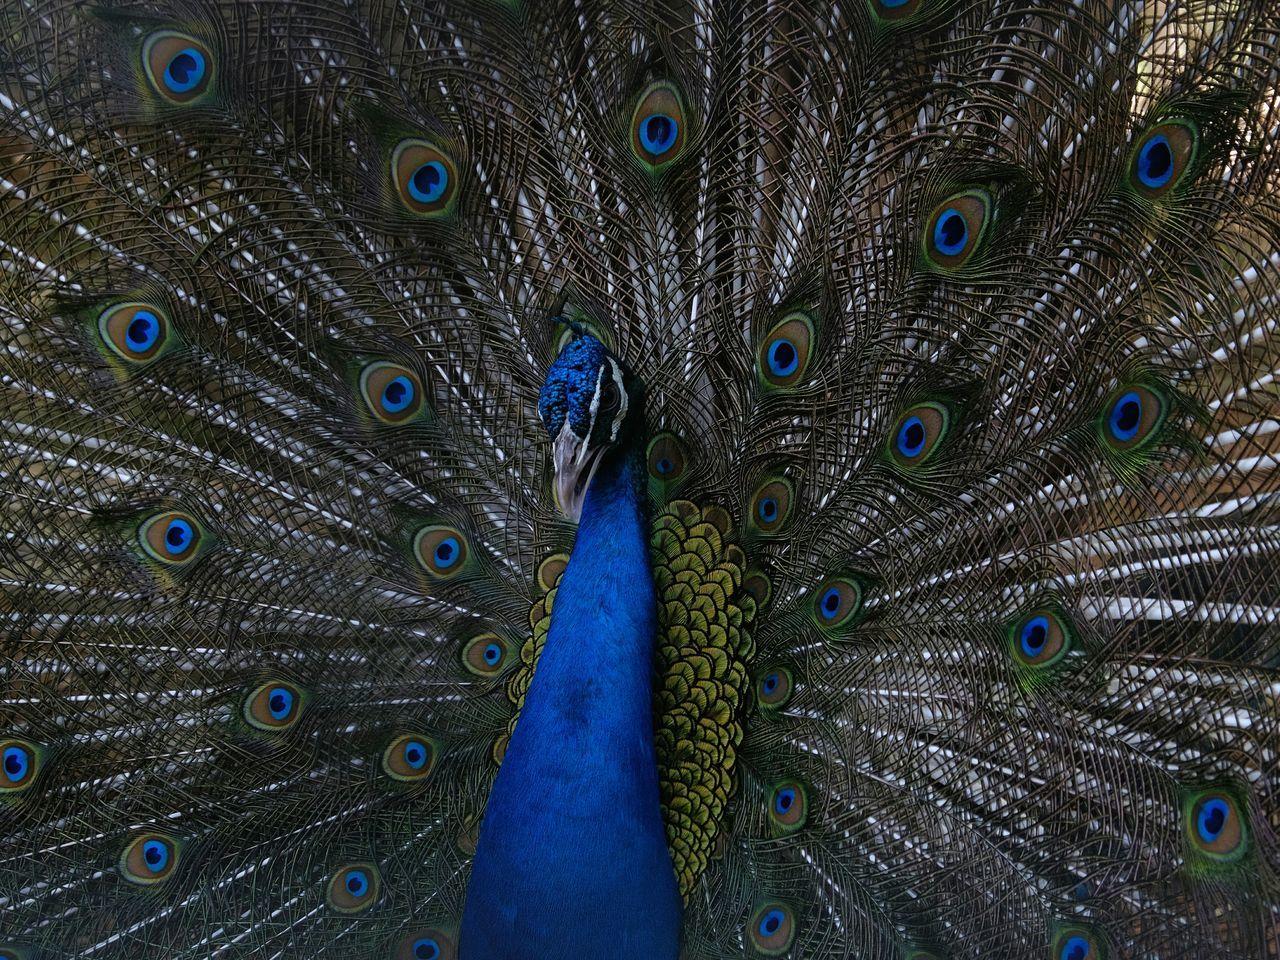 Peacock Birds Of EyeEm  Birds_collection Bird Photography Peacock Peacock Blue Beauty Beauty Bird Beautiful Colors